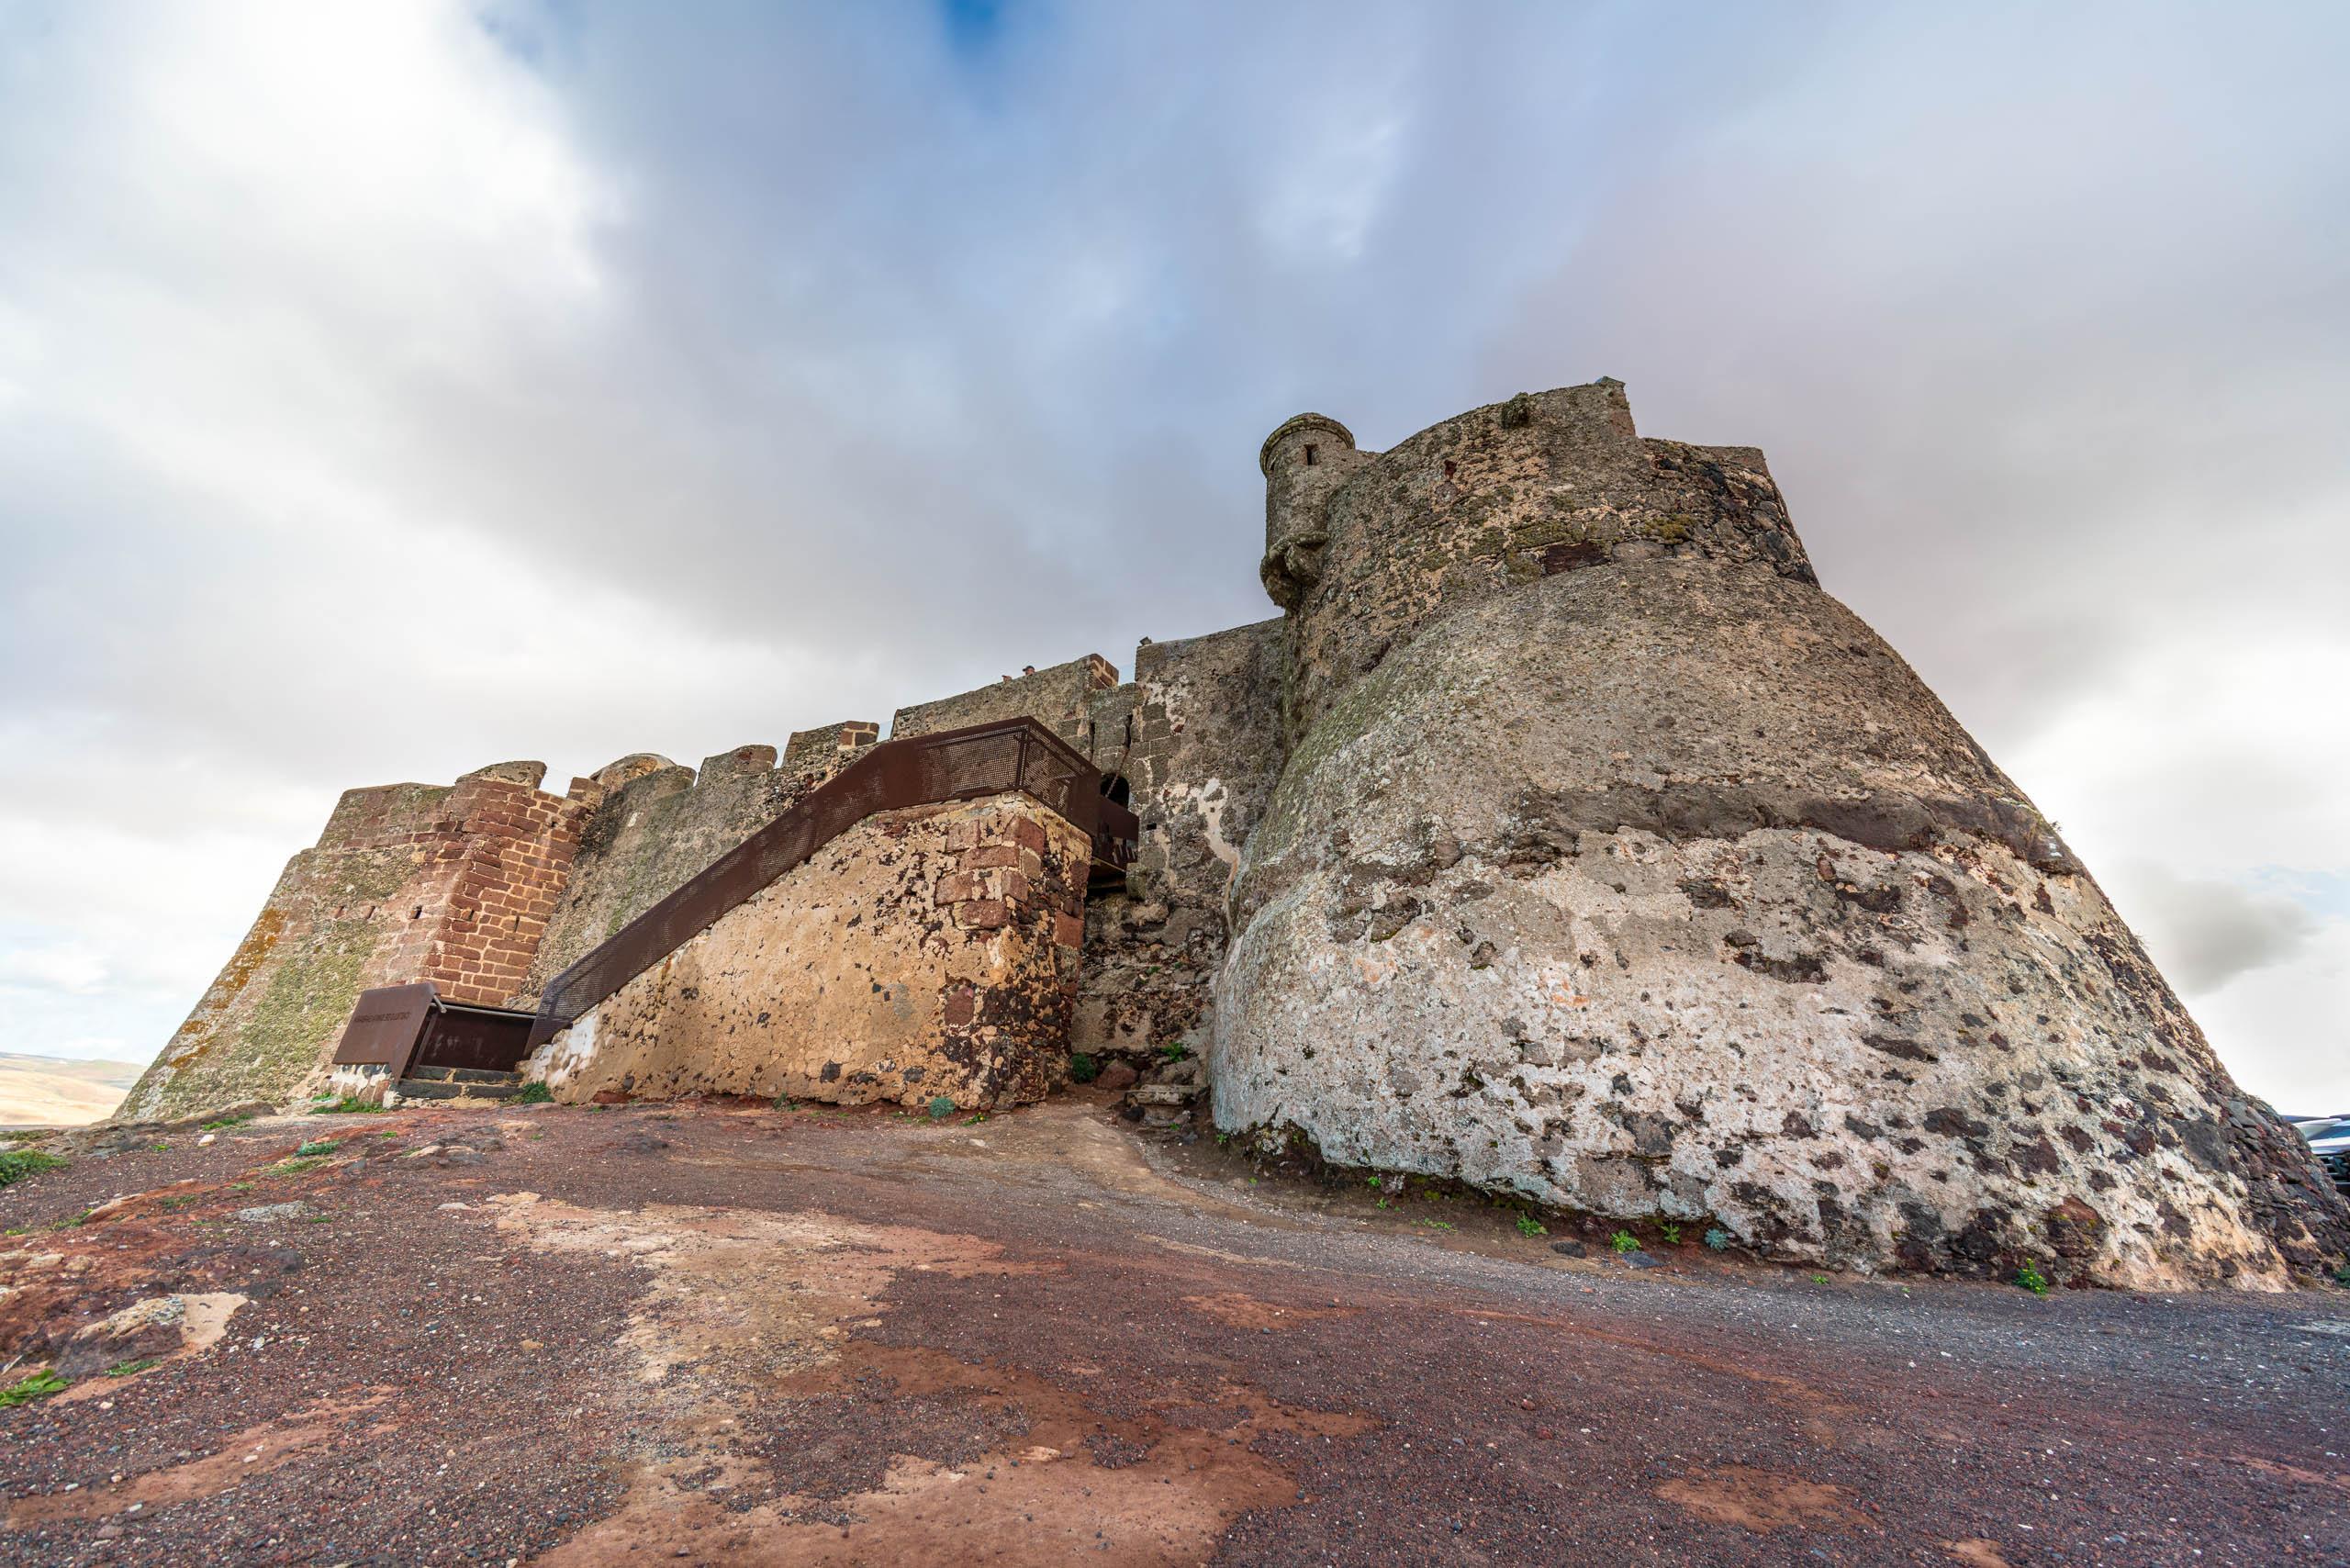 Castillo de Santa Barbara | f/8 1/250sec ISO-100 12mm  | ILCE-7RM3 | 2019-01-27 12:20:35